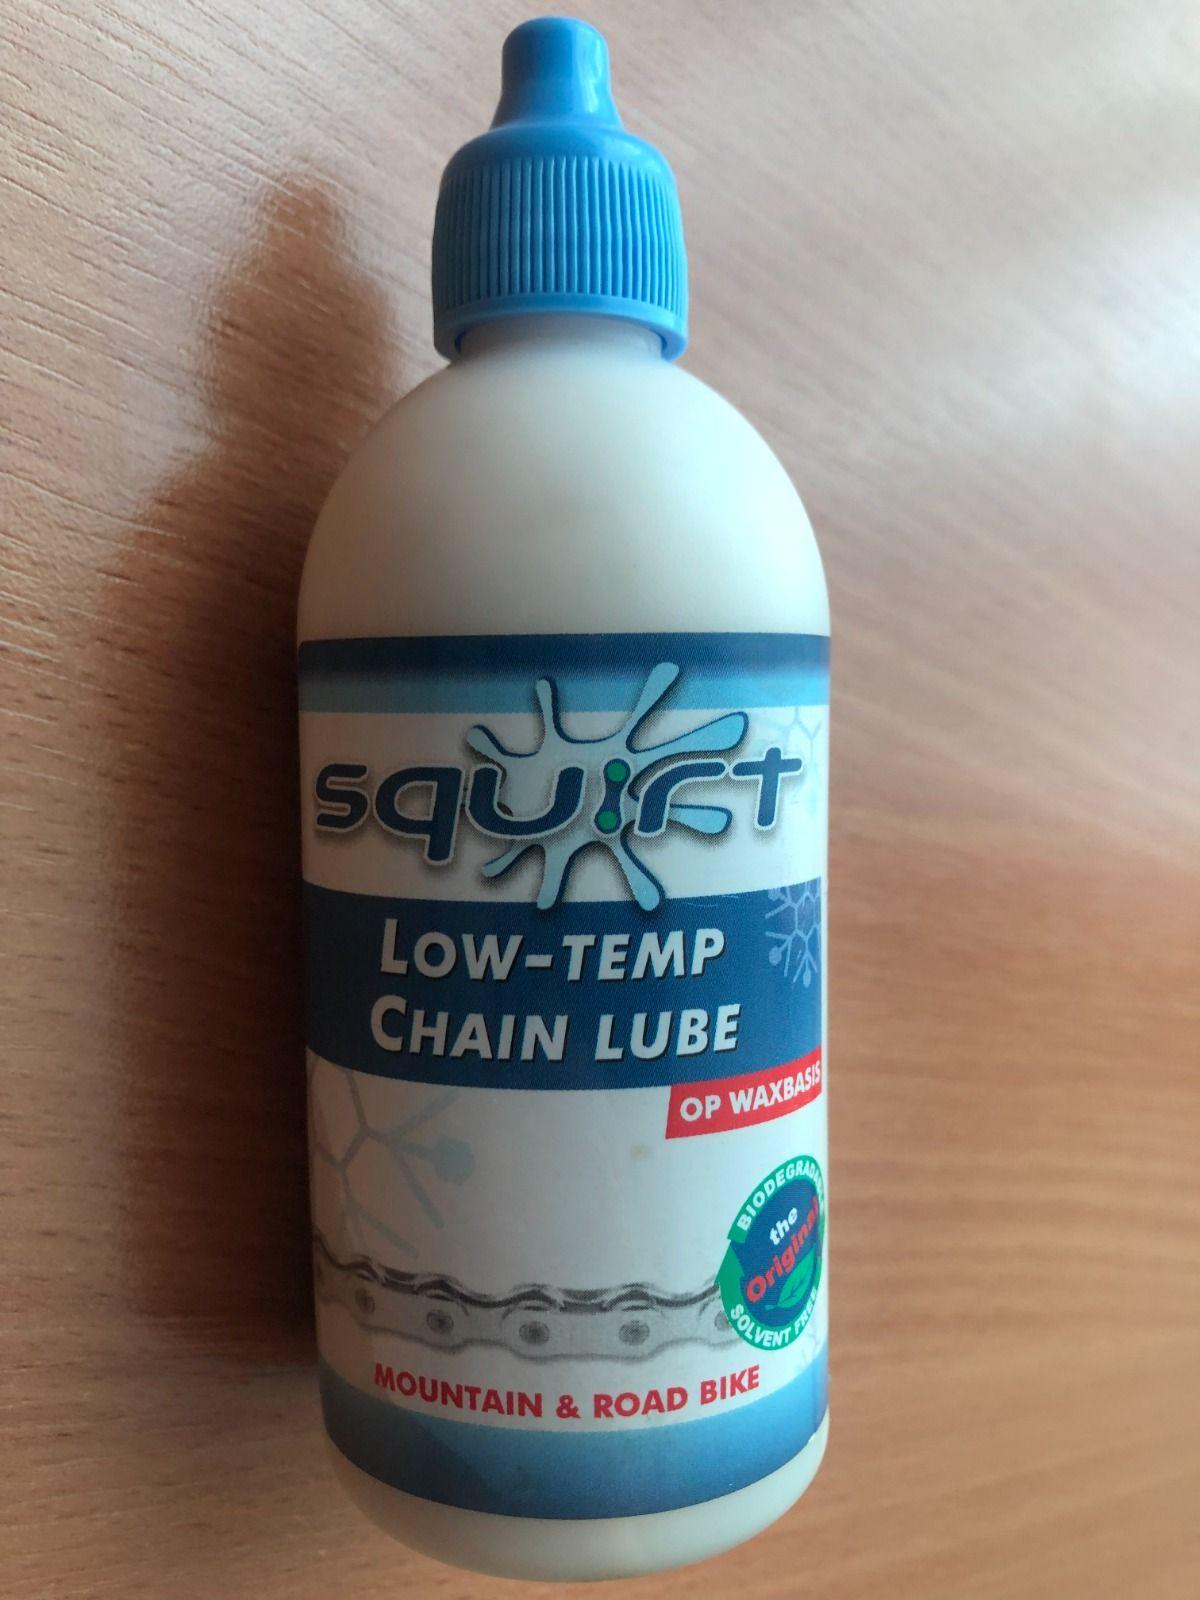 Squirt Low-temp Chain lube 120мл.